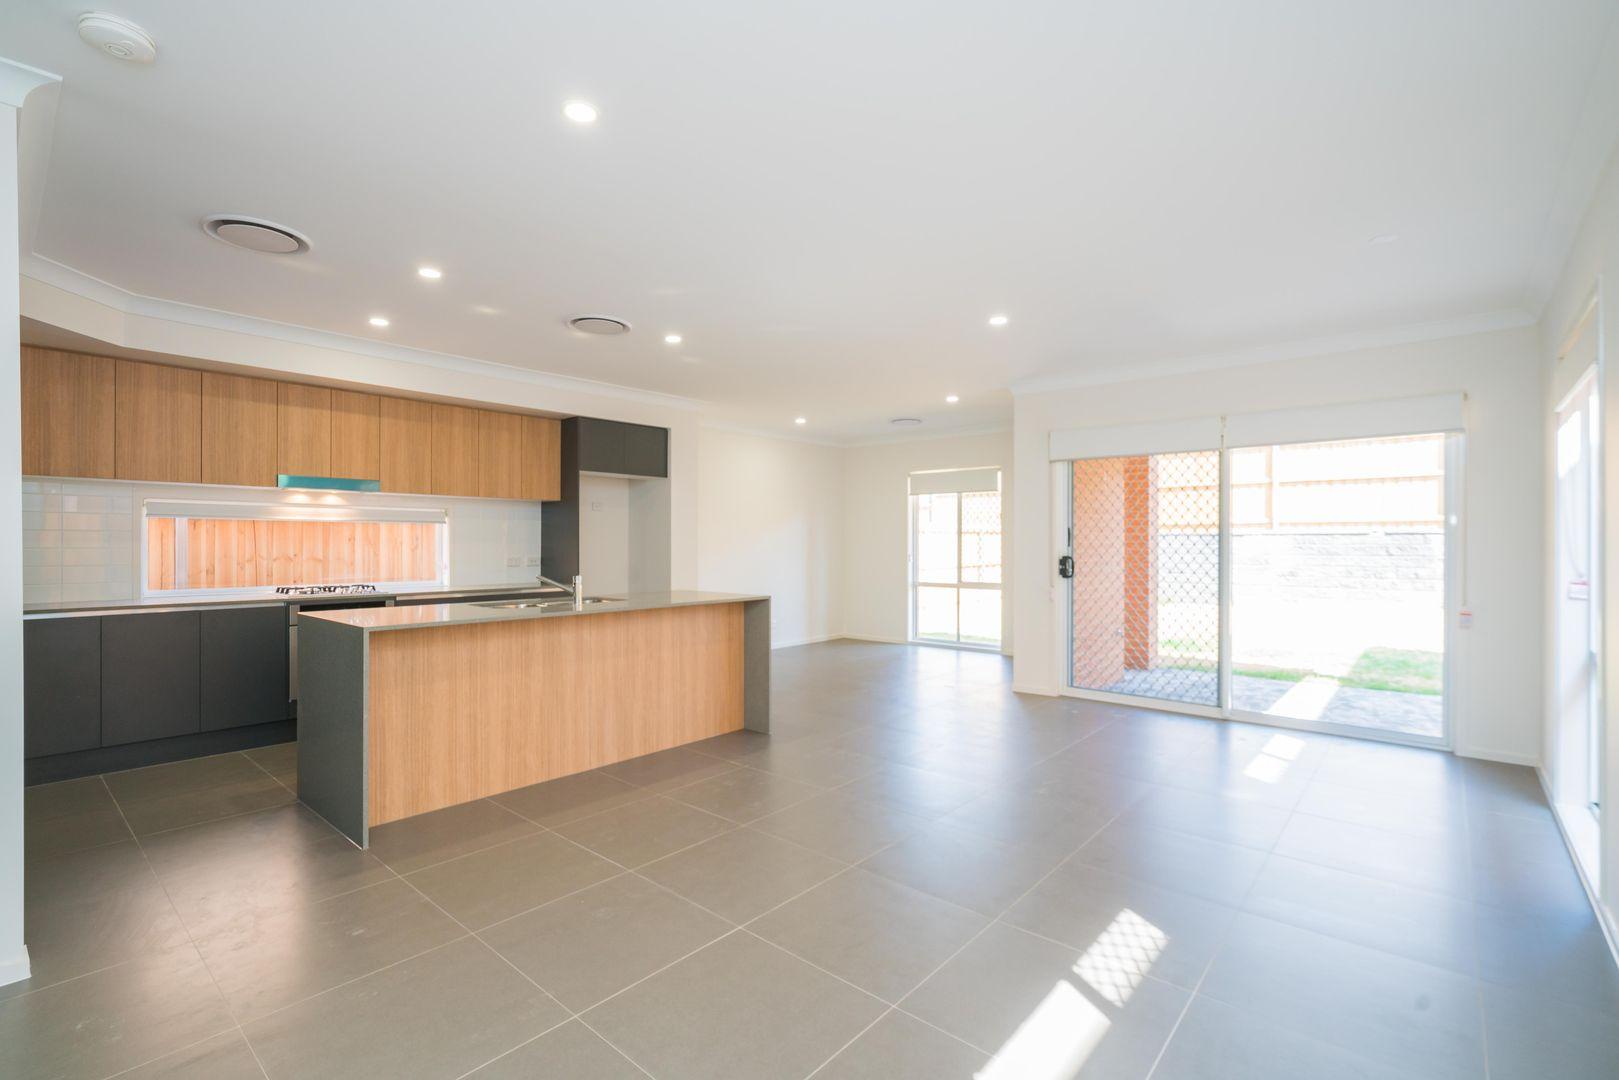 128 Dalmatia Ave, Edmondson Park NSW 2174, Image 2